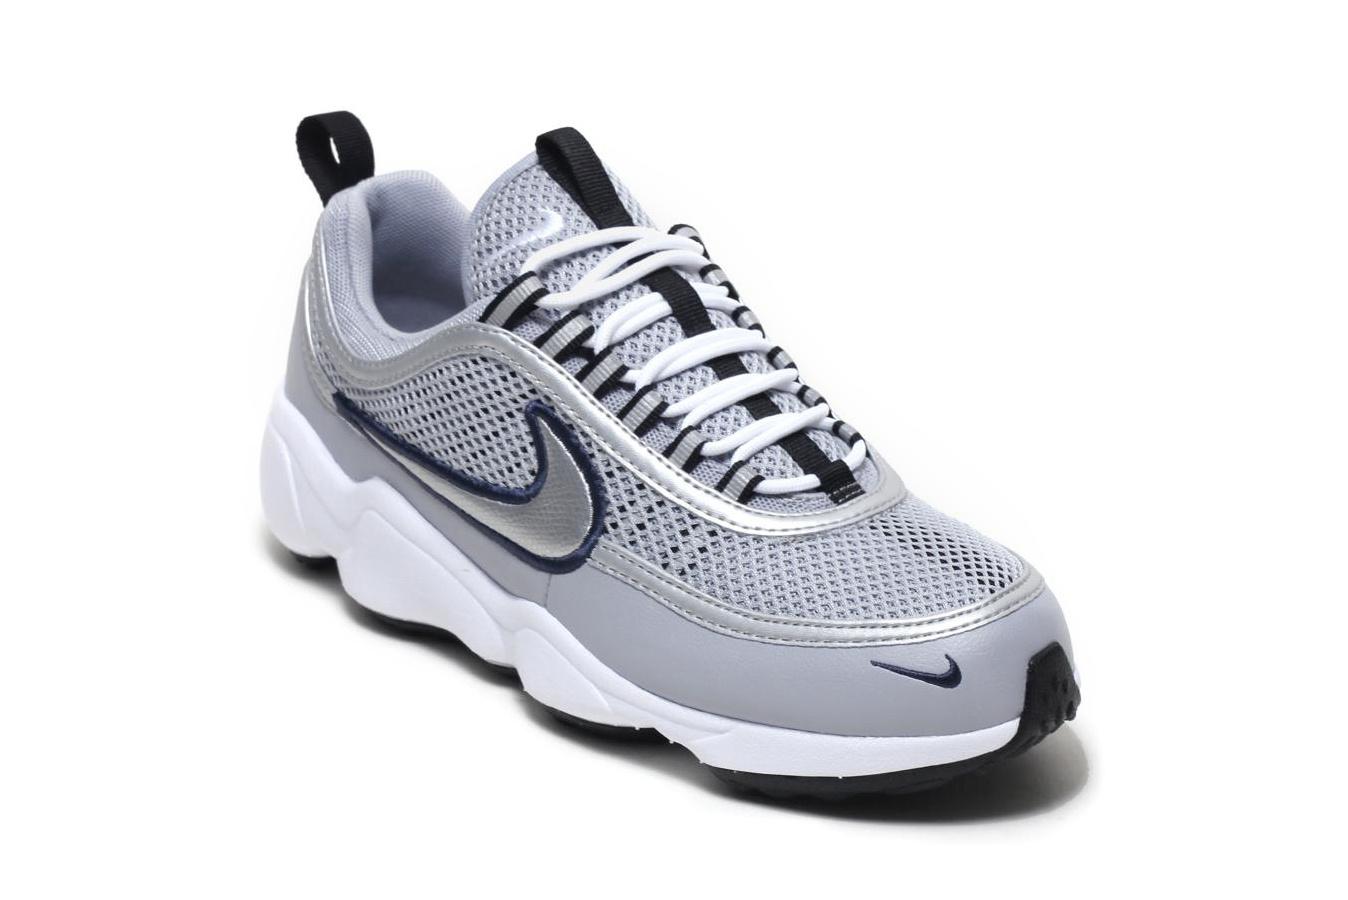 Nike Air Zoom Spiridon In 'Wolf Grey